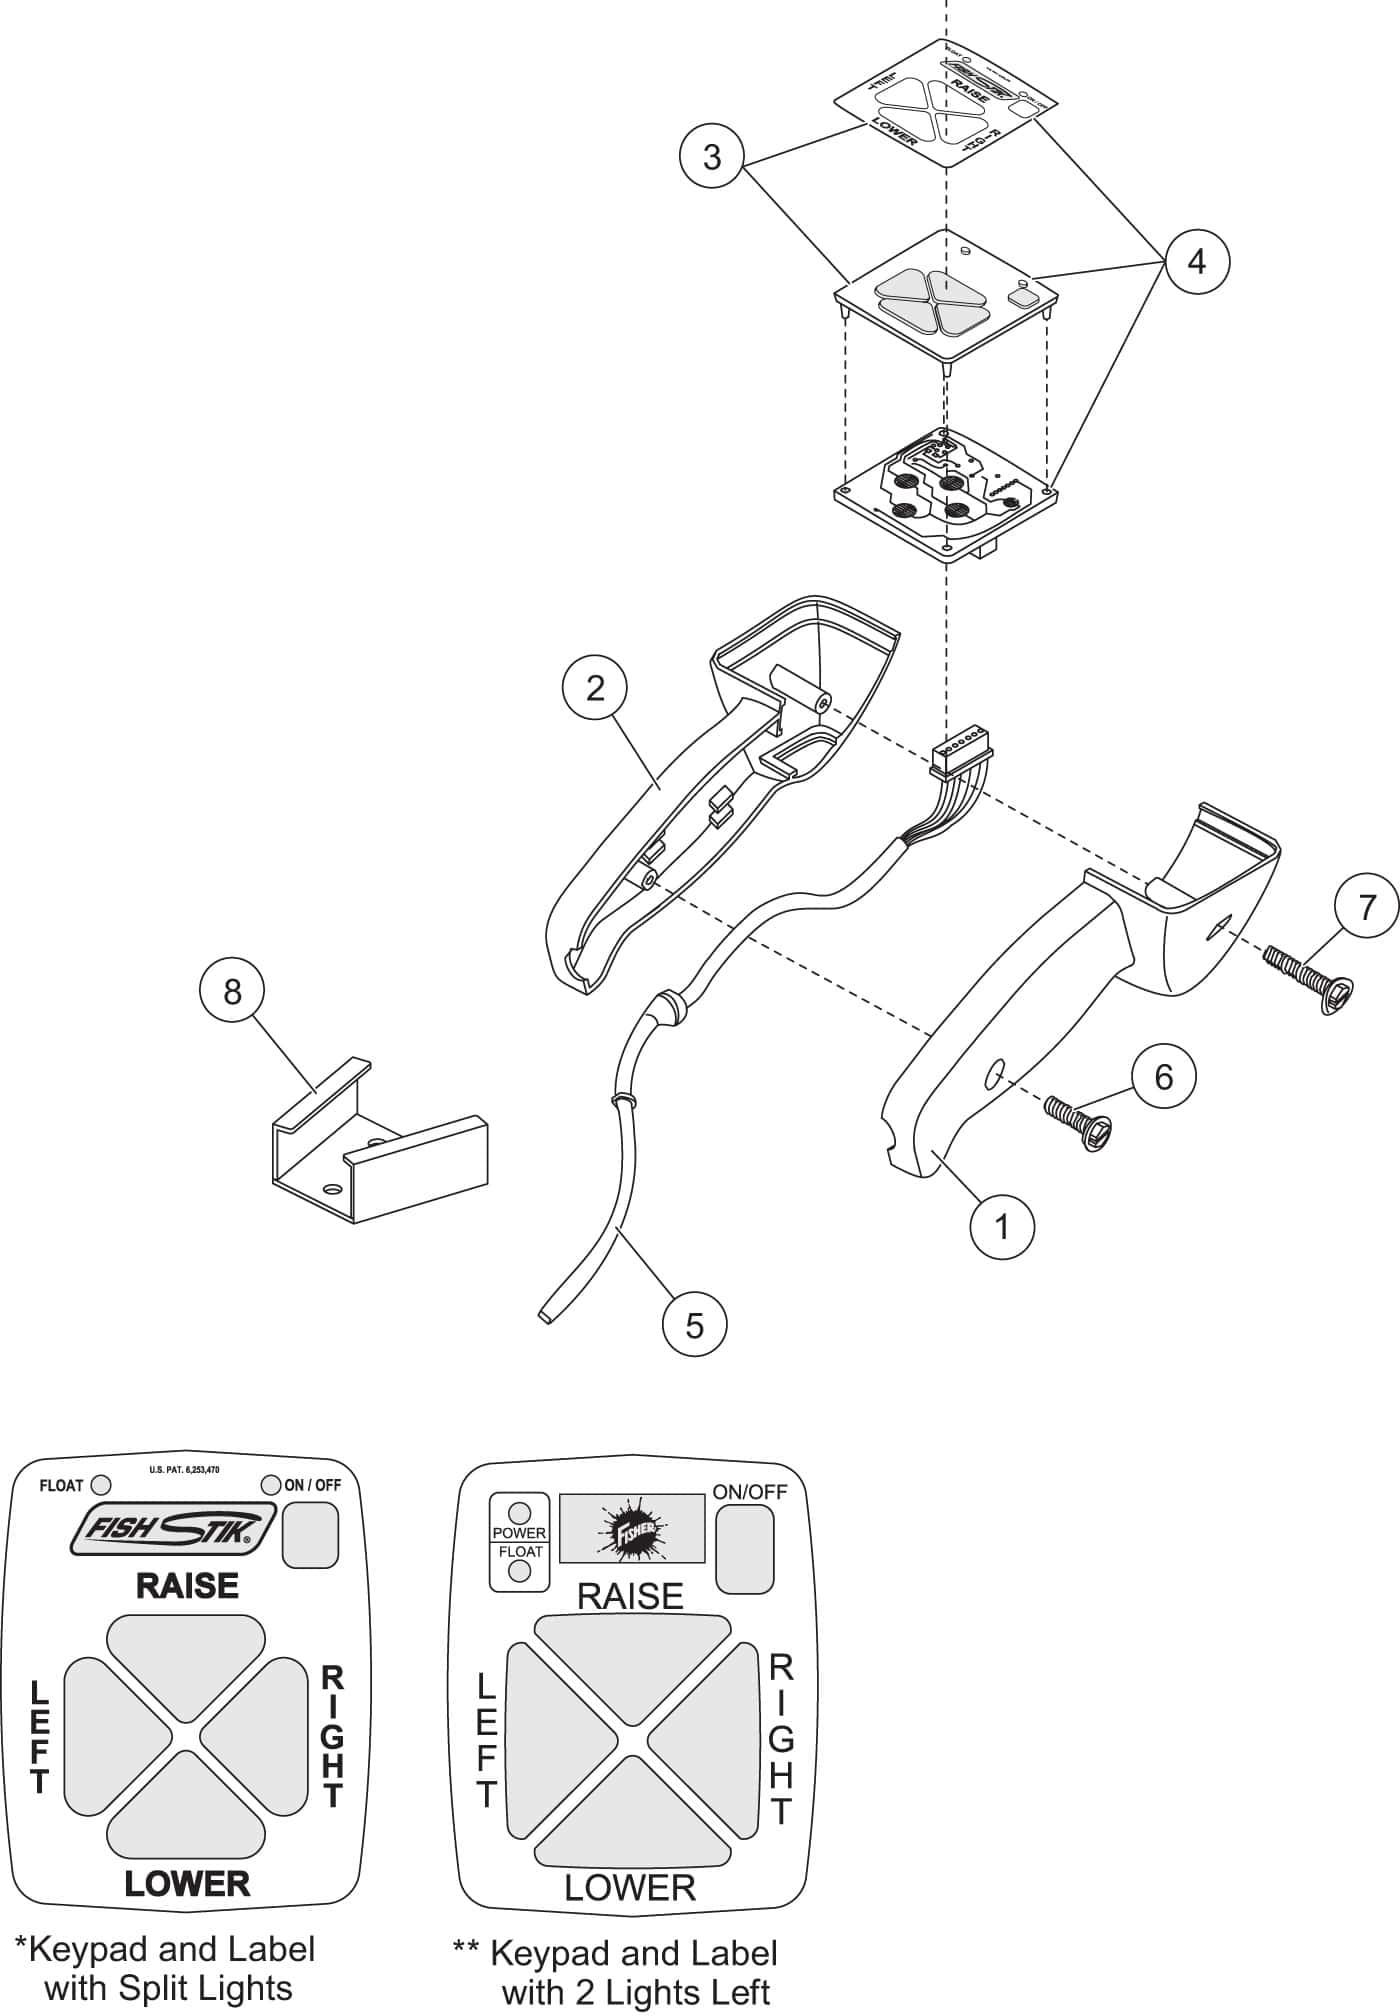 Surprising pequea trailer wiring diagram photos best image nice cargo mate trailer wiring diagram contemporary electrical swarovskicordoba Images